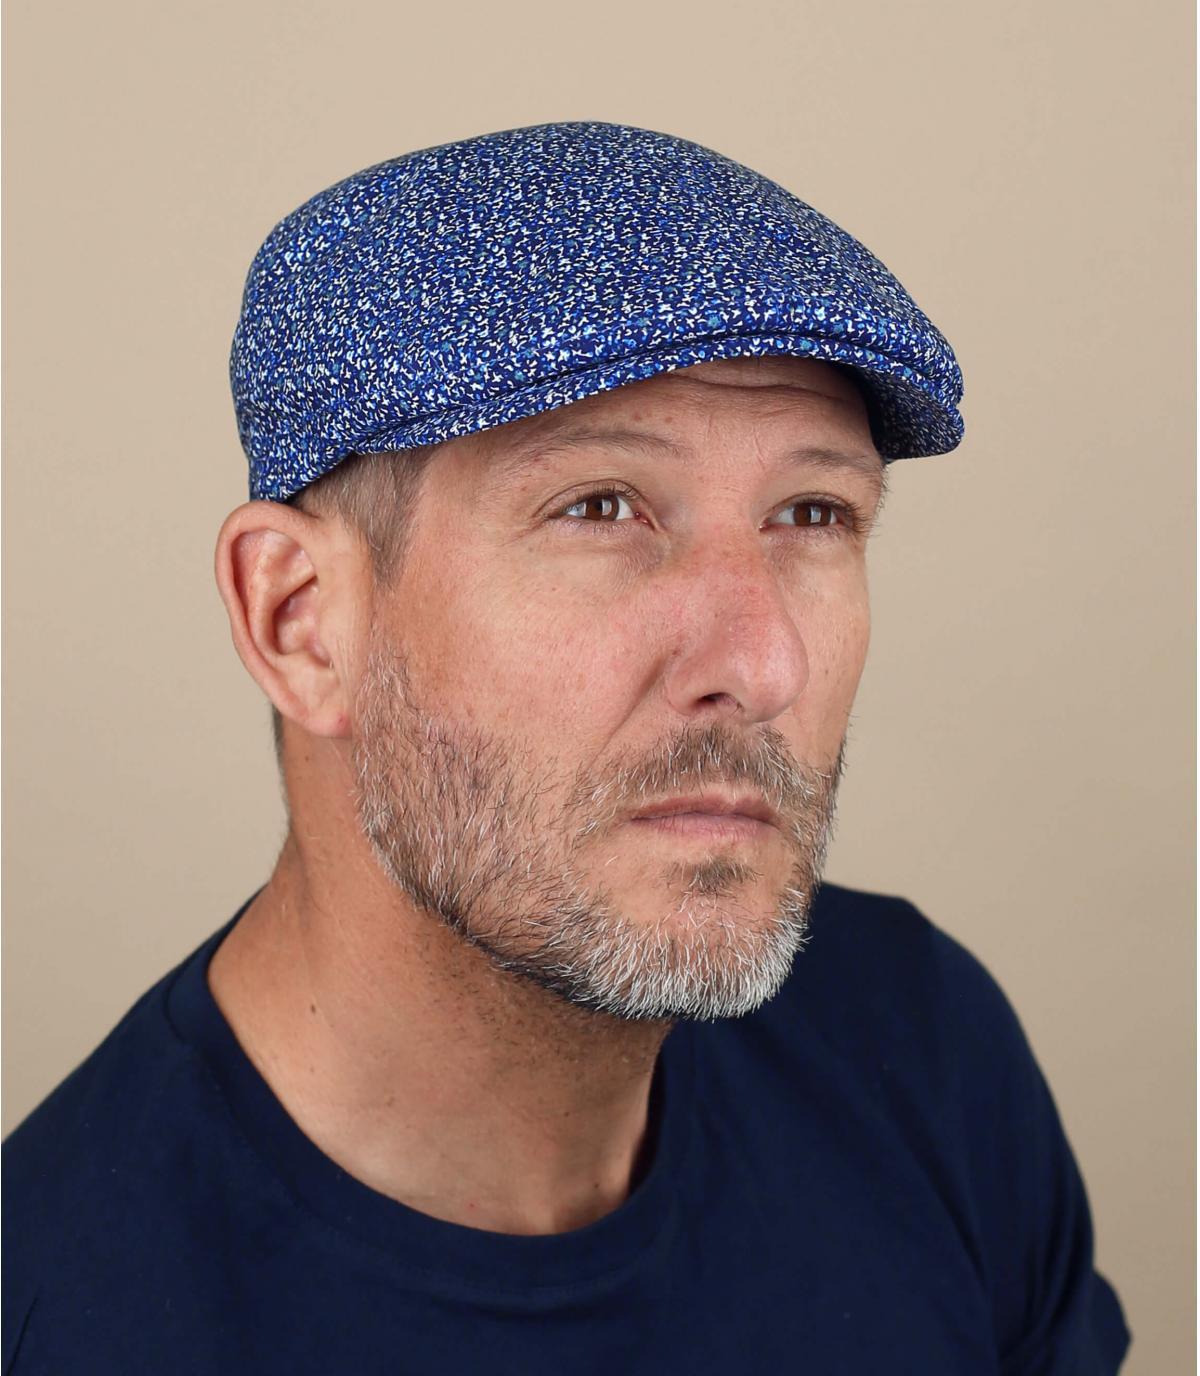 heather blue cap